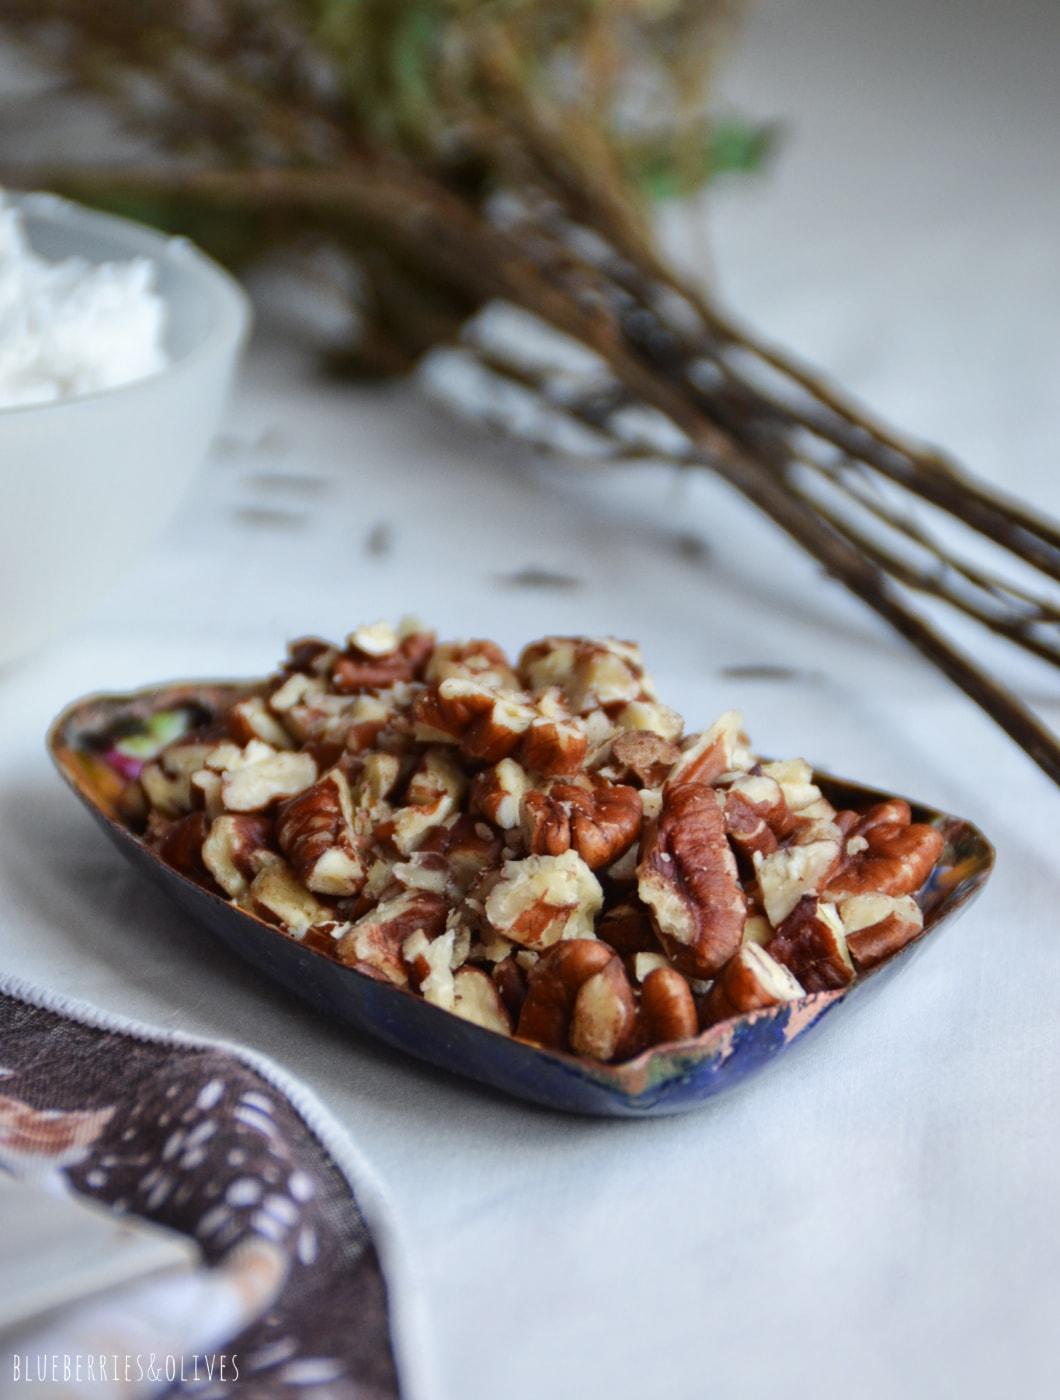 CHOPPED PECAN NUTS